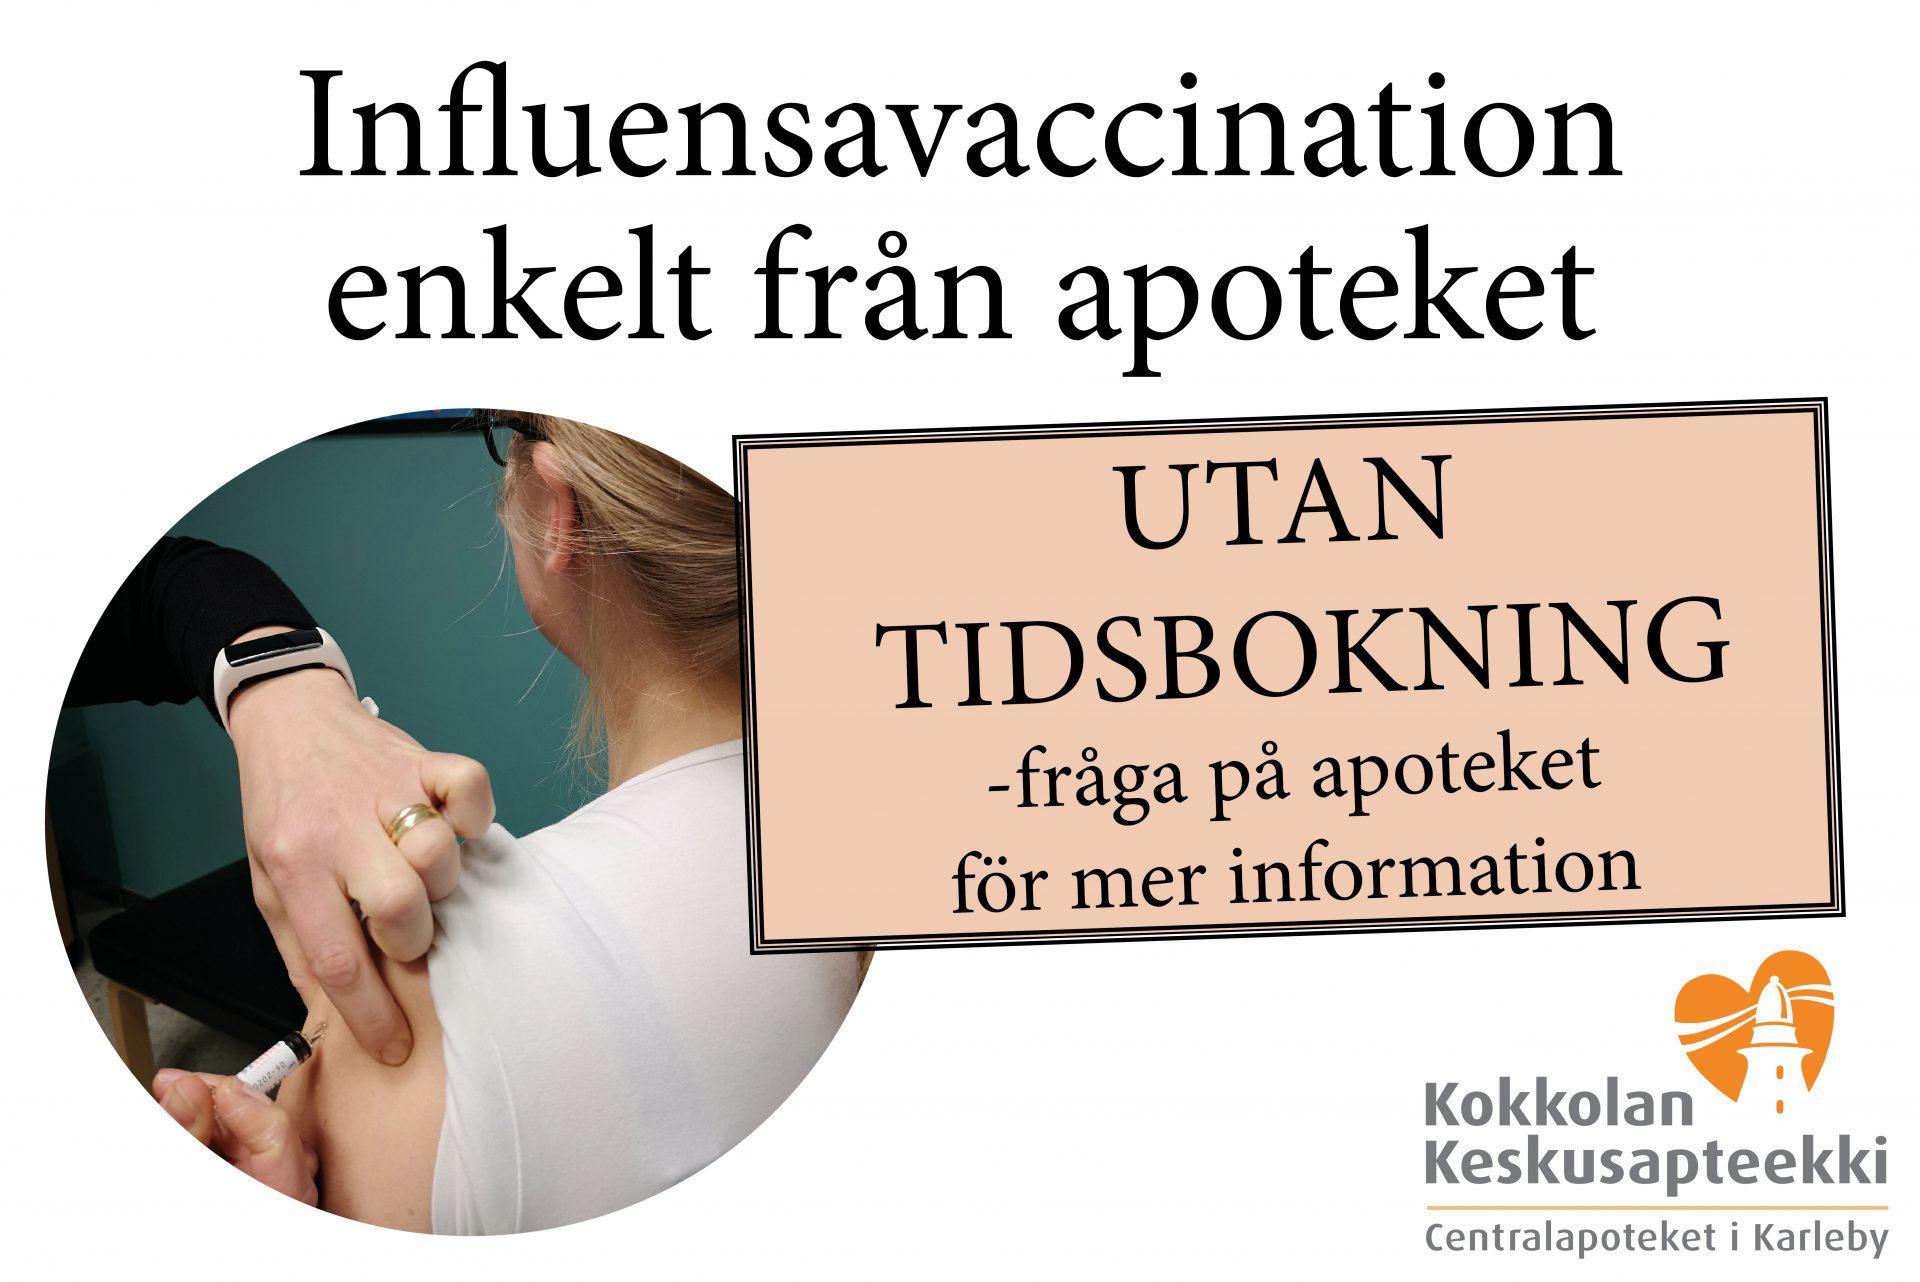 InfluenssamainosKoti(sv)